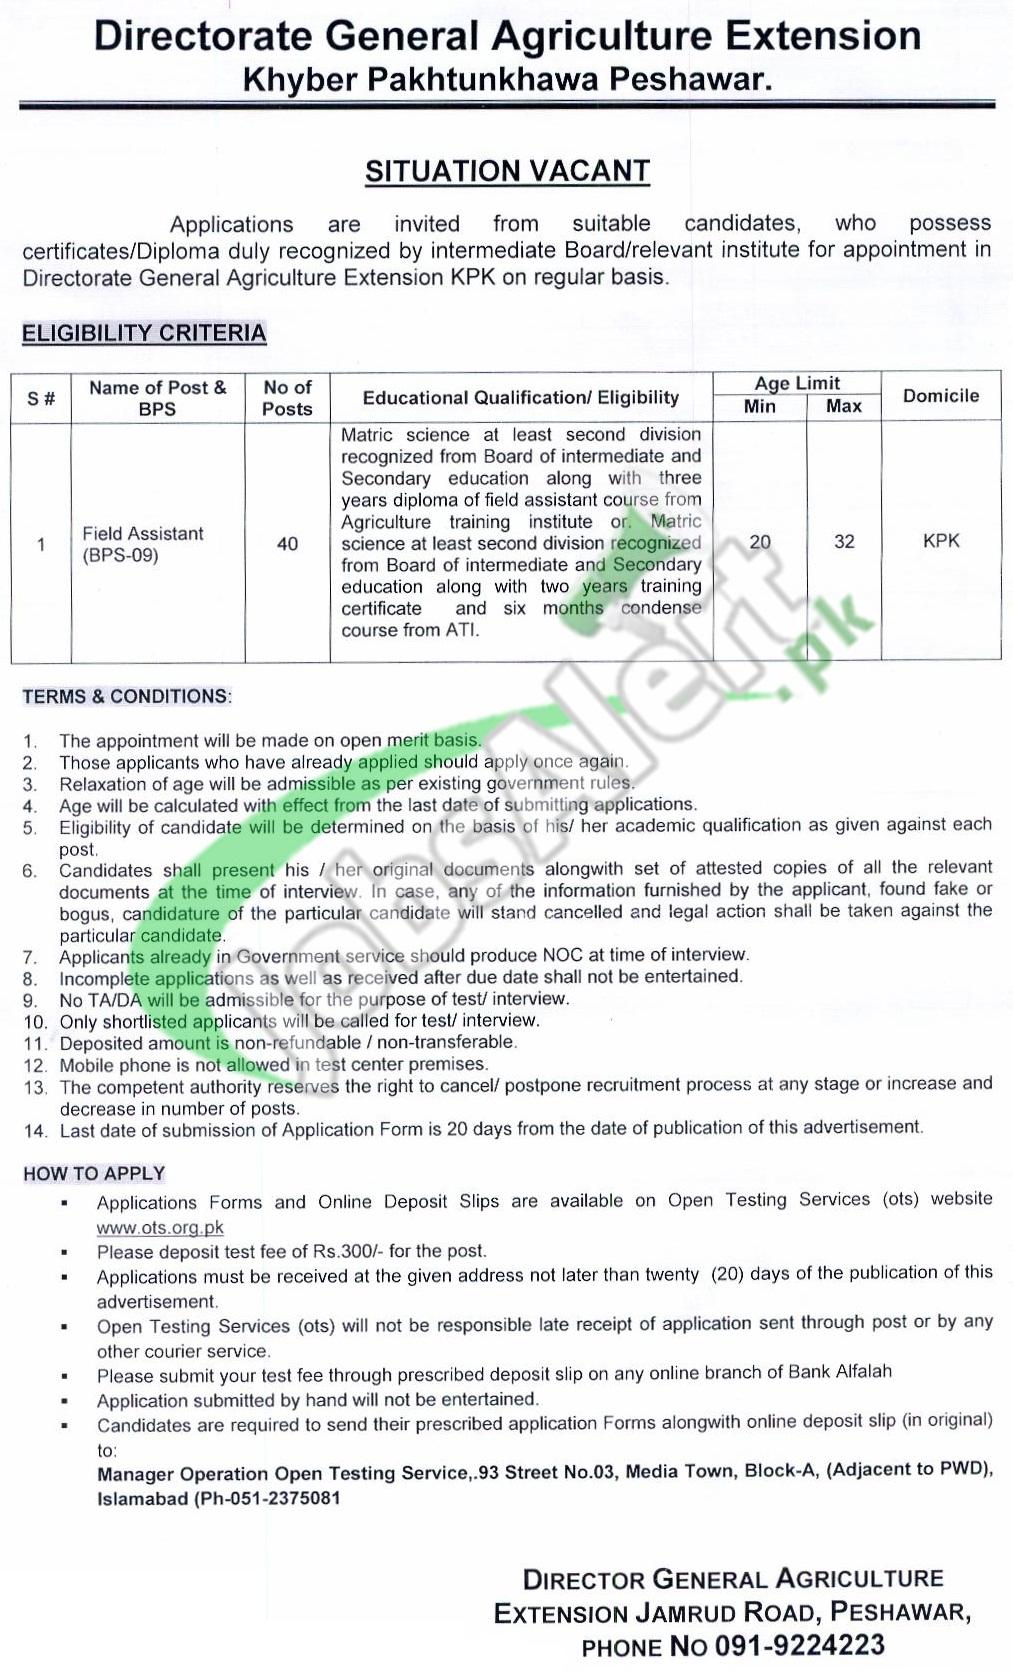 Directorate General Agriculture Extension KPK Peshawar Jobs